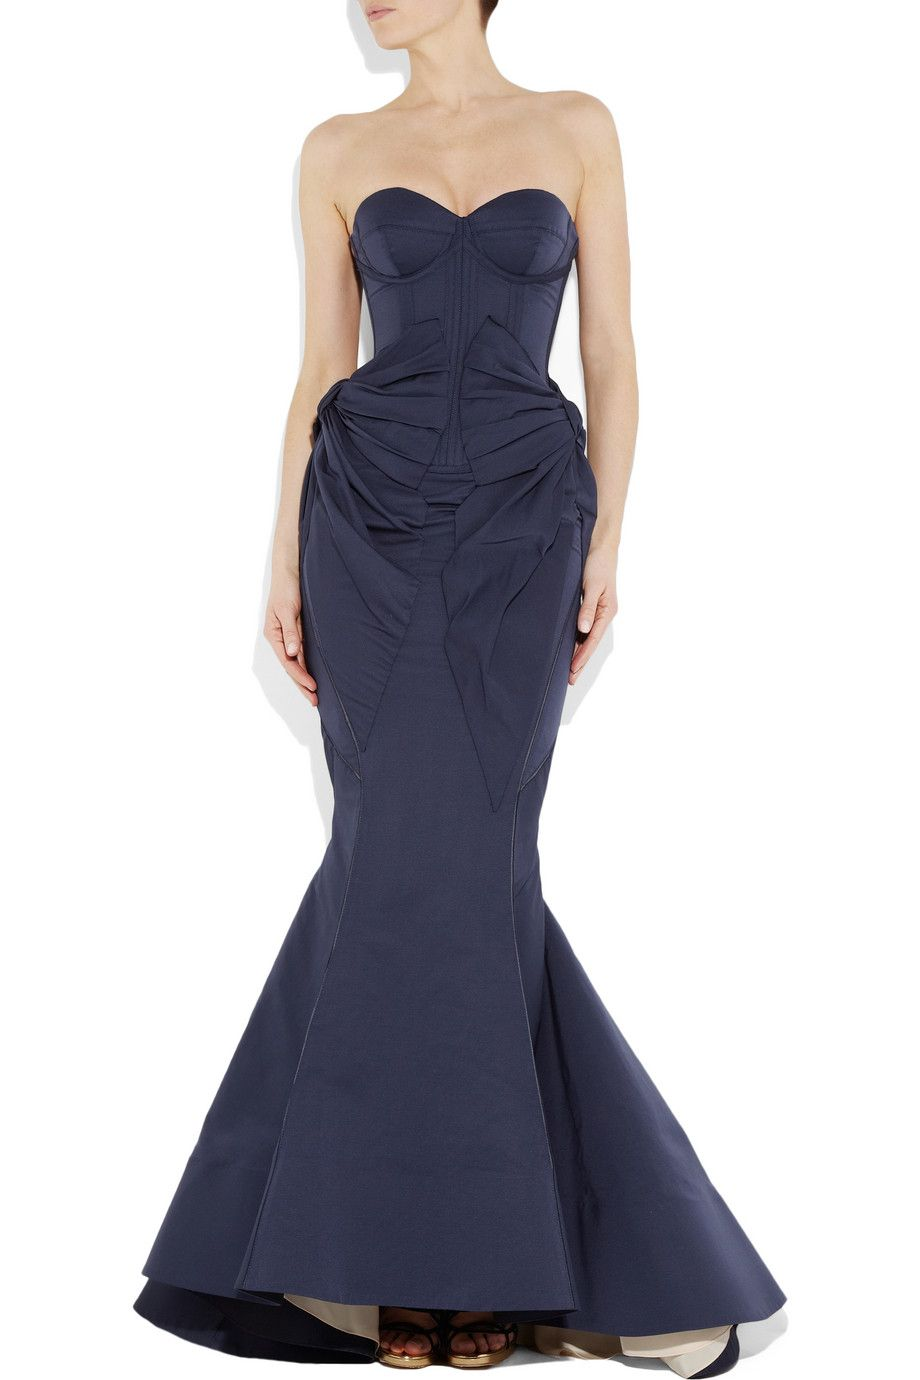 ZAC POSEN Bustier fishtail gown. #wedding dress | My Style ...